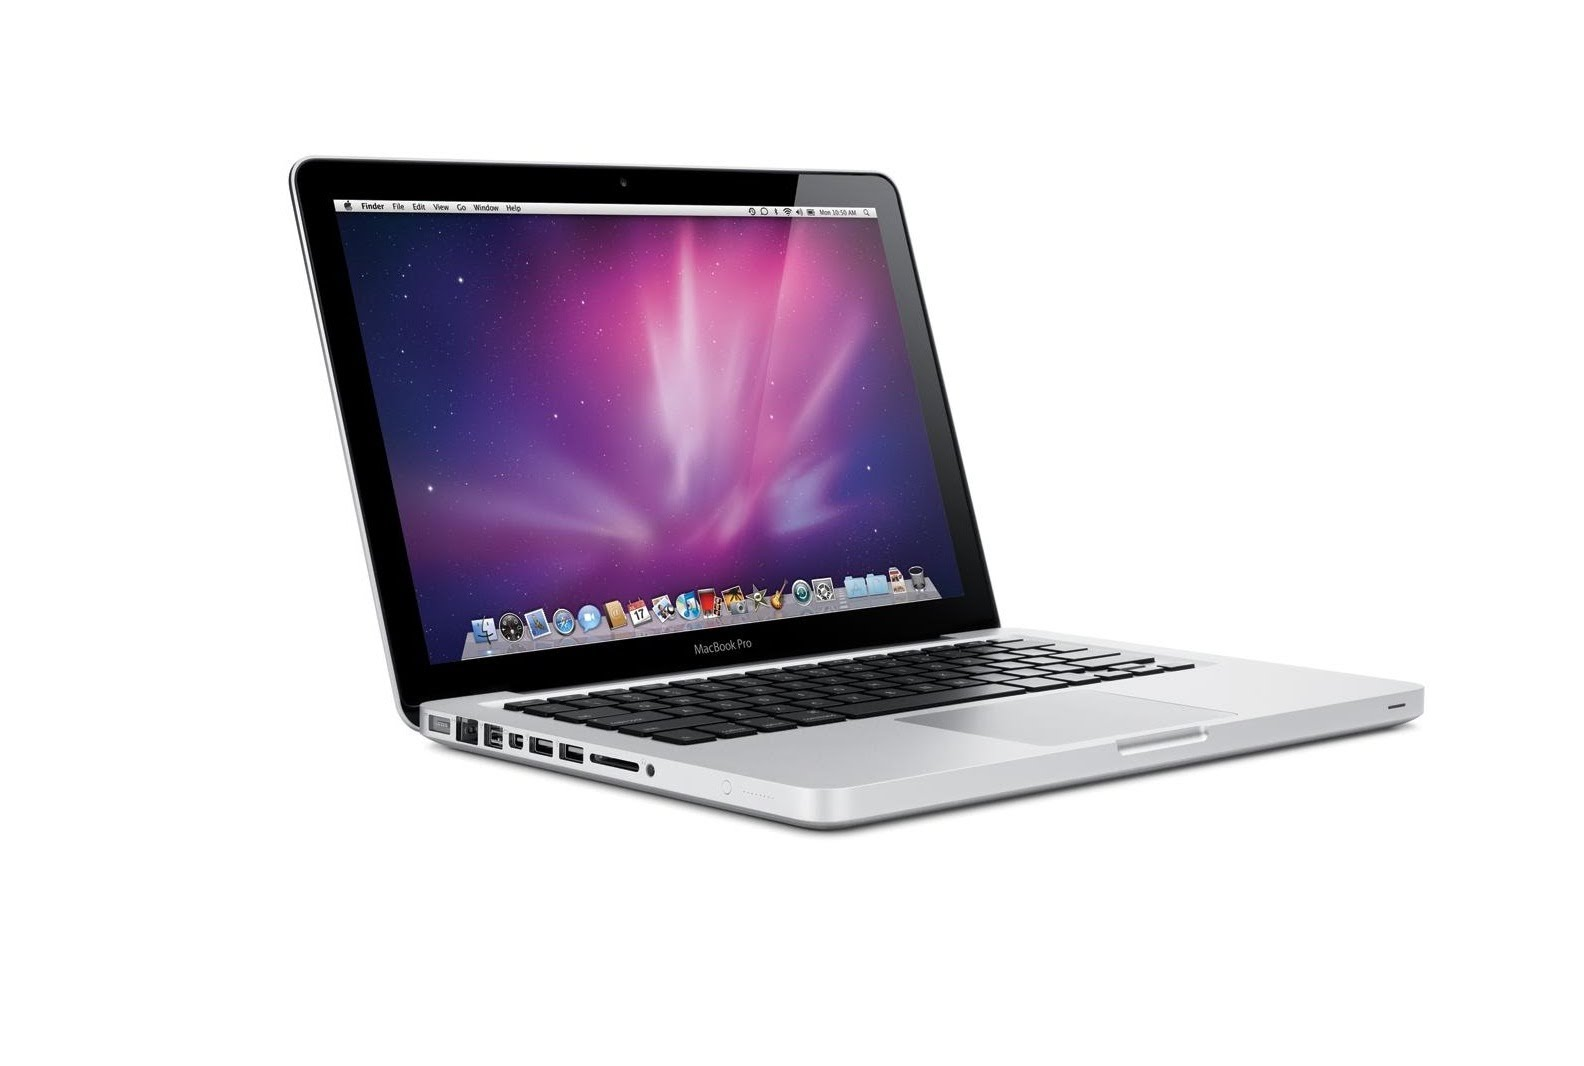 【予約販売】【送料無料】【中古】高速起動!MacBook/13インチ/Core2Duo/新品SSD240GB換装済!/メモリ4G/Late 2008(A1278)MB466J/A